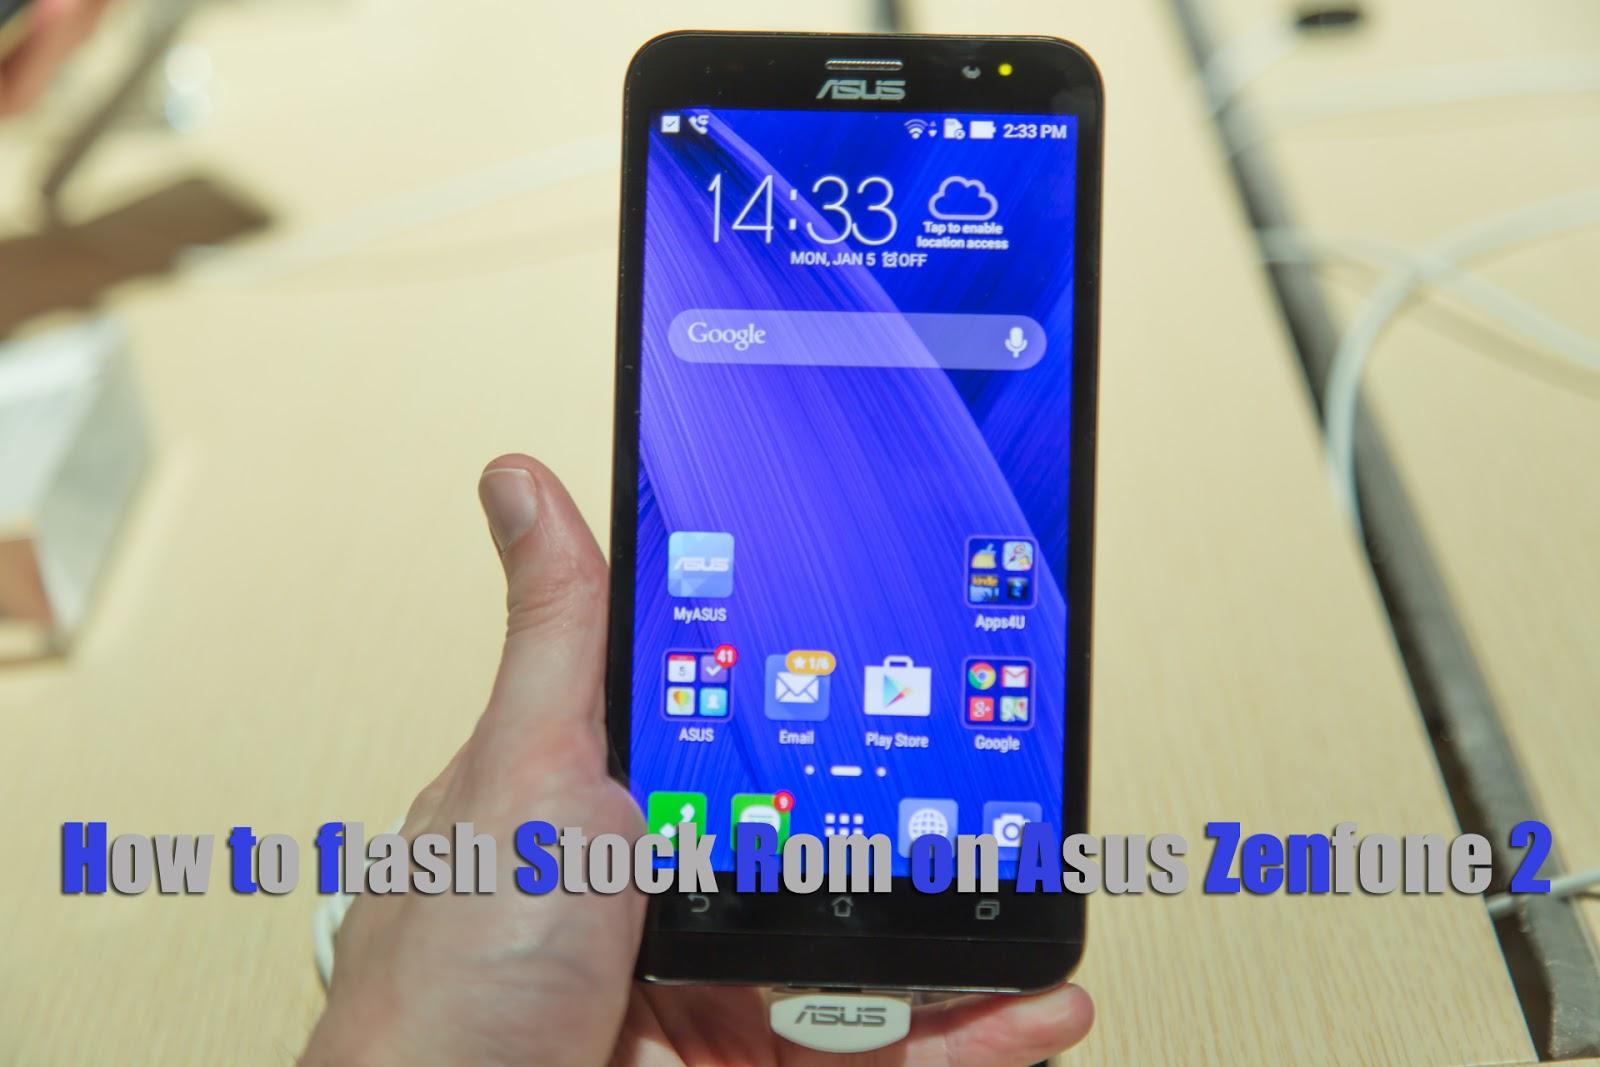 Zenfone 2 Stock Rom Steps To Flash Stock Rom On Asus Zenfone 2